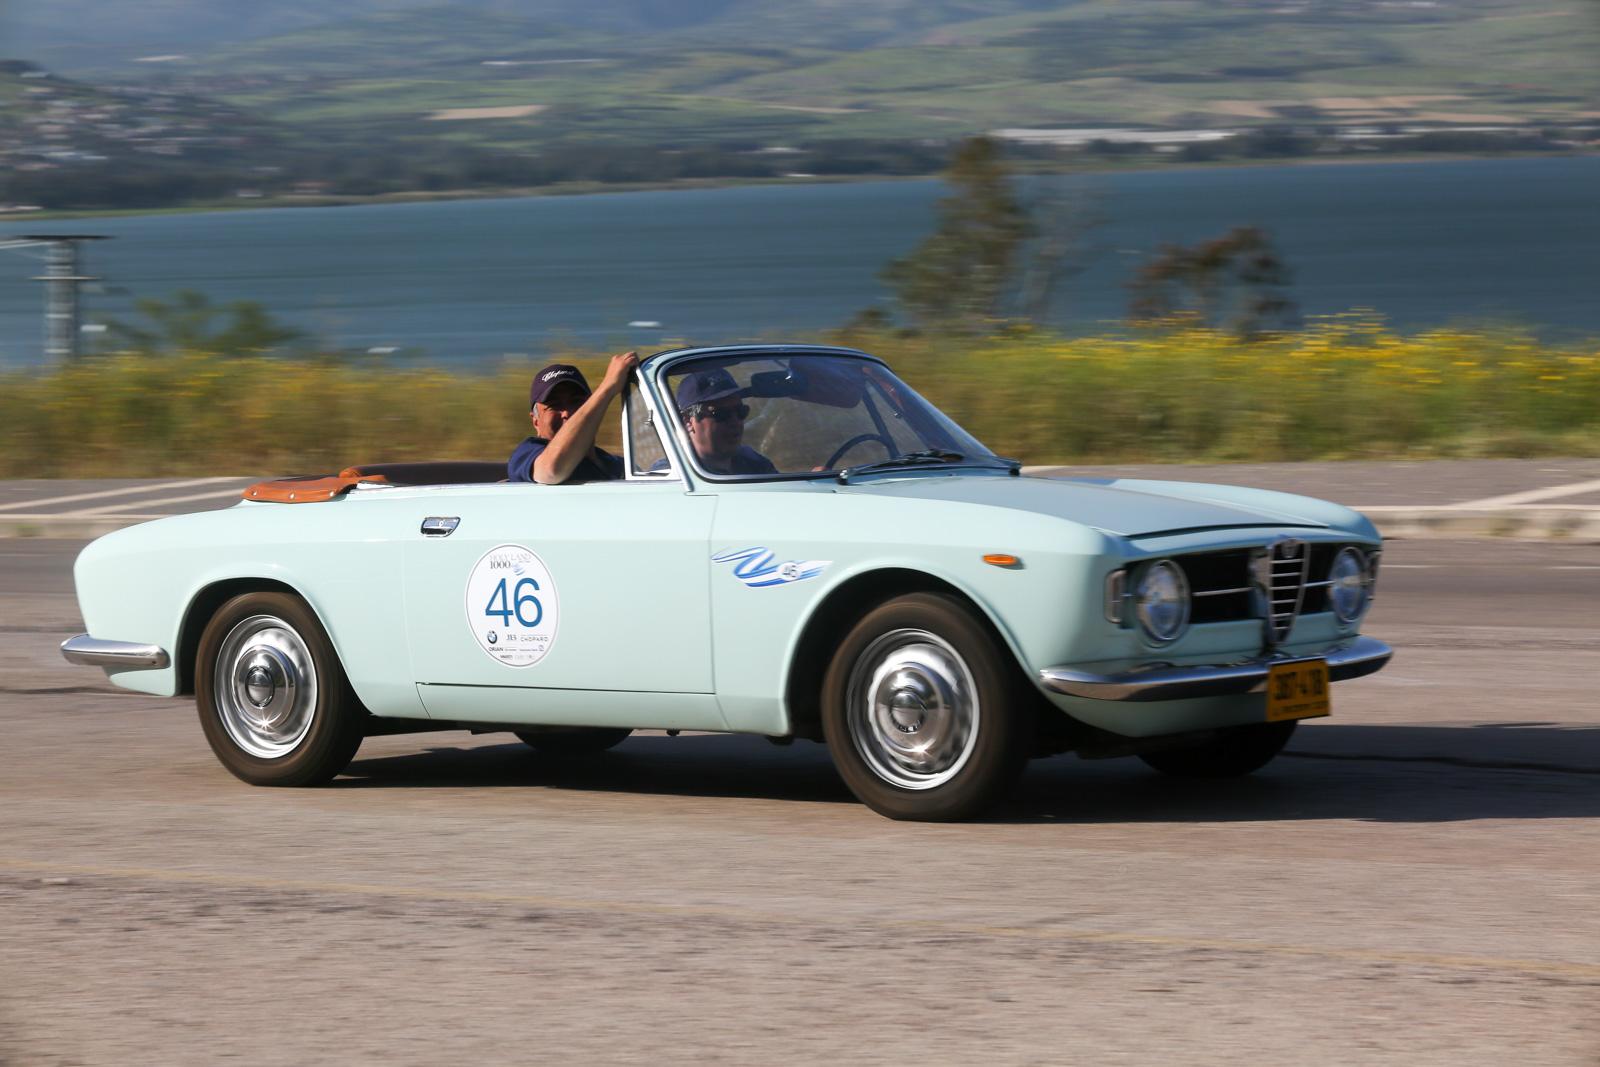 Alfa Romeo Giulia GTC 1965, Israel